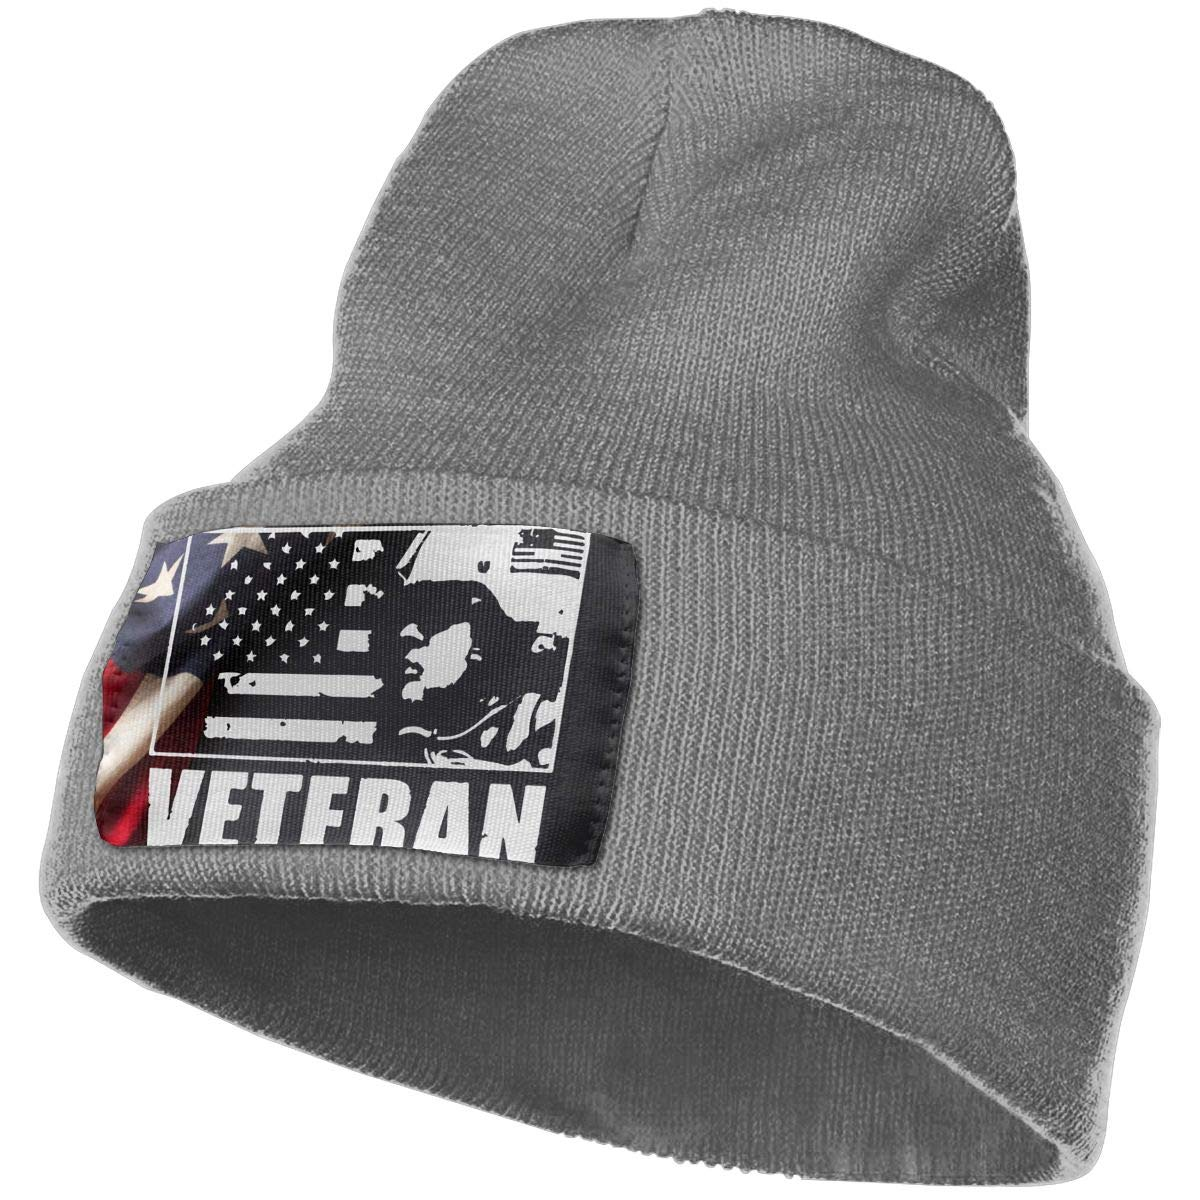 Veteran Military Soldier Ski Cap Men Women Knitting Hats Stretchy /& Soft Beanie